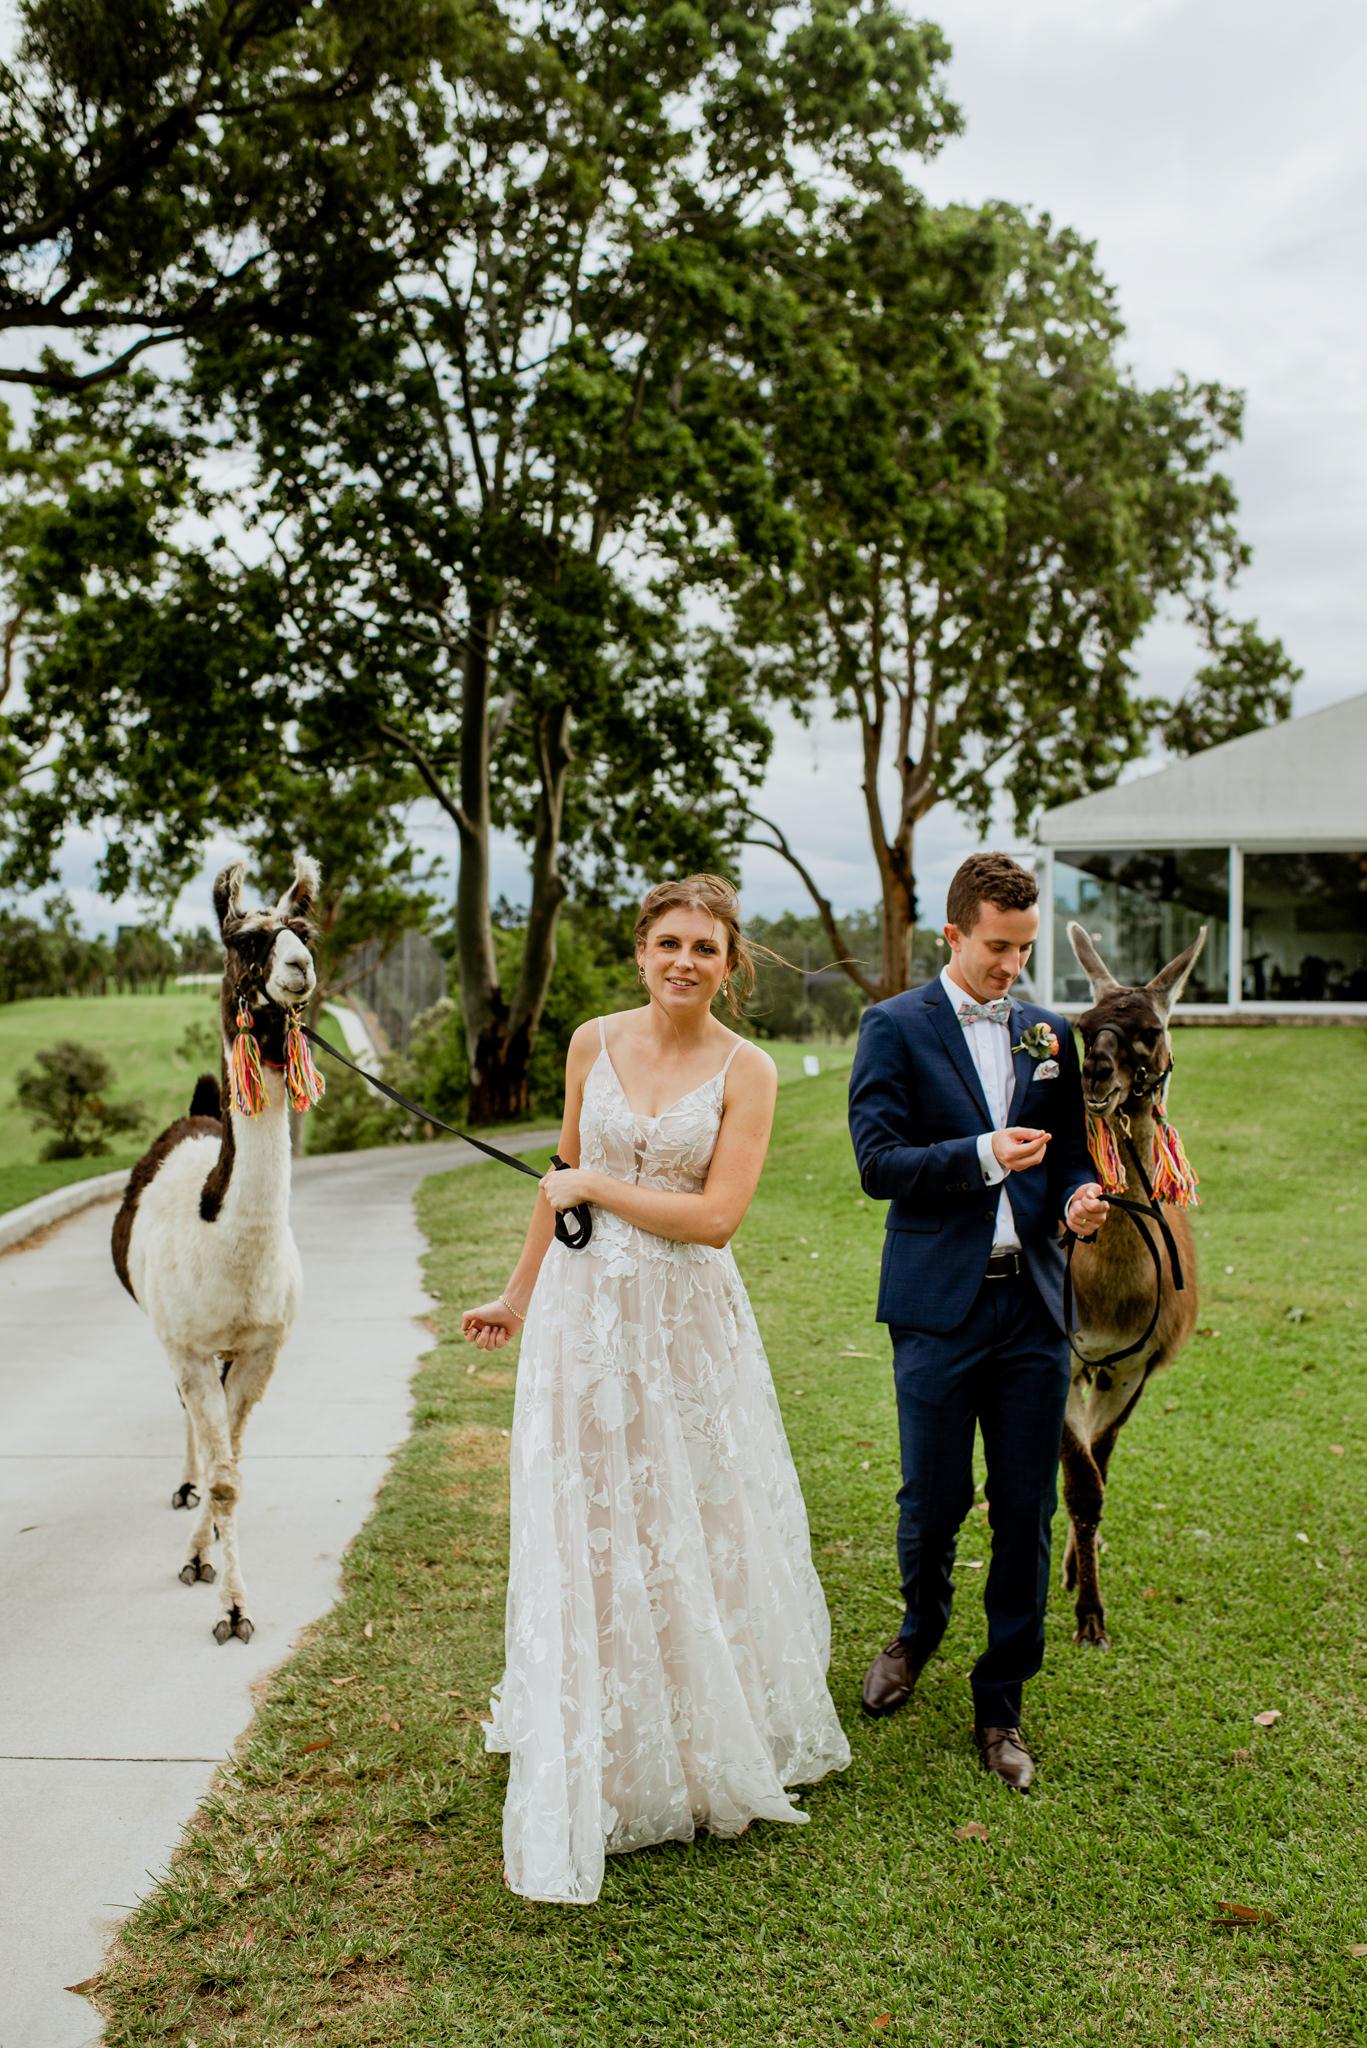 Newlyweds walking together with llamas on leashes